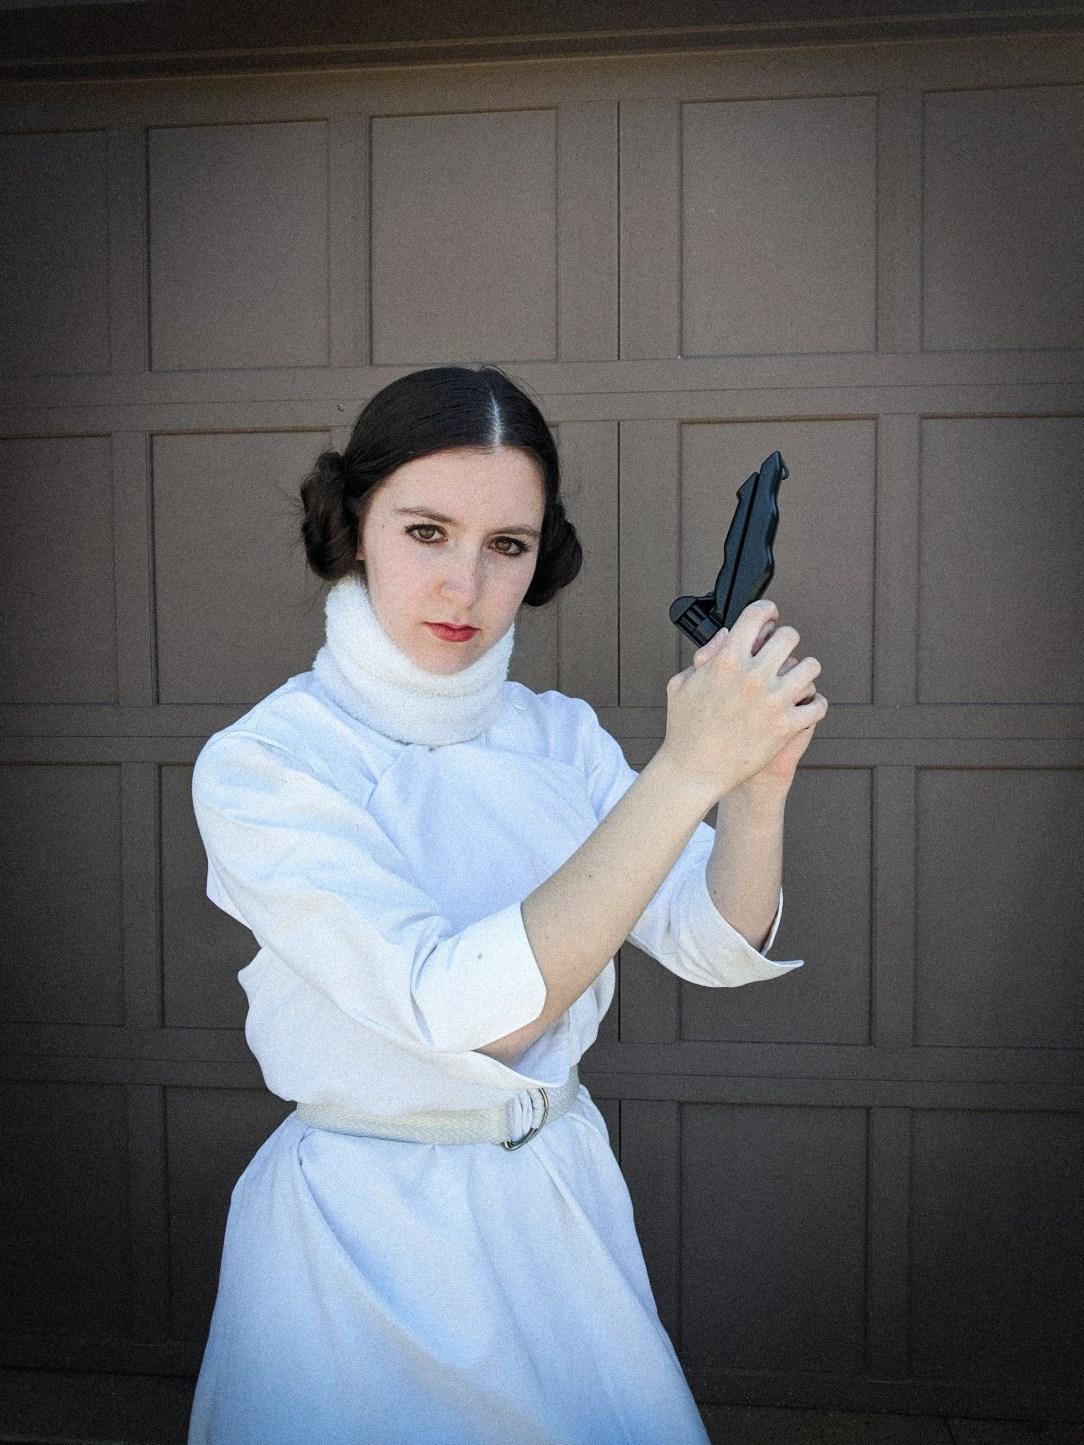 Star Wars day, quarantine activities